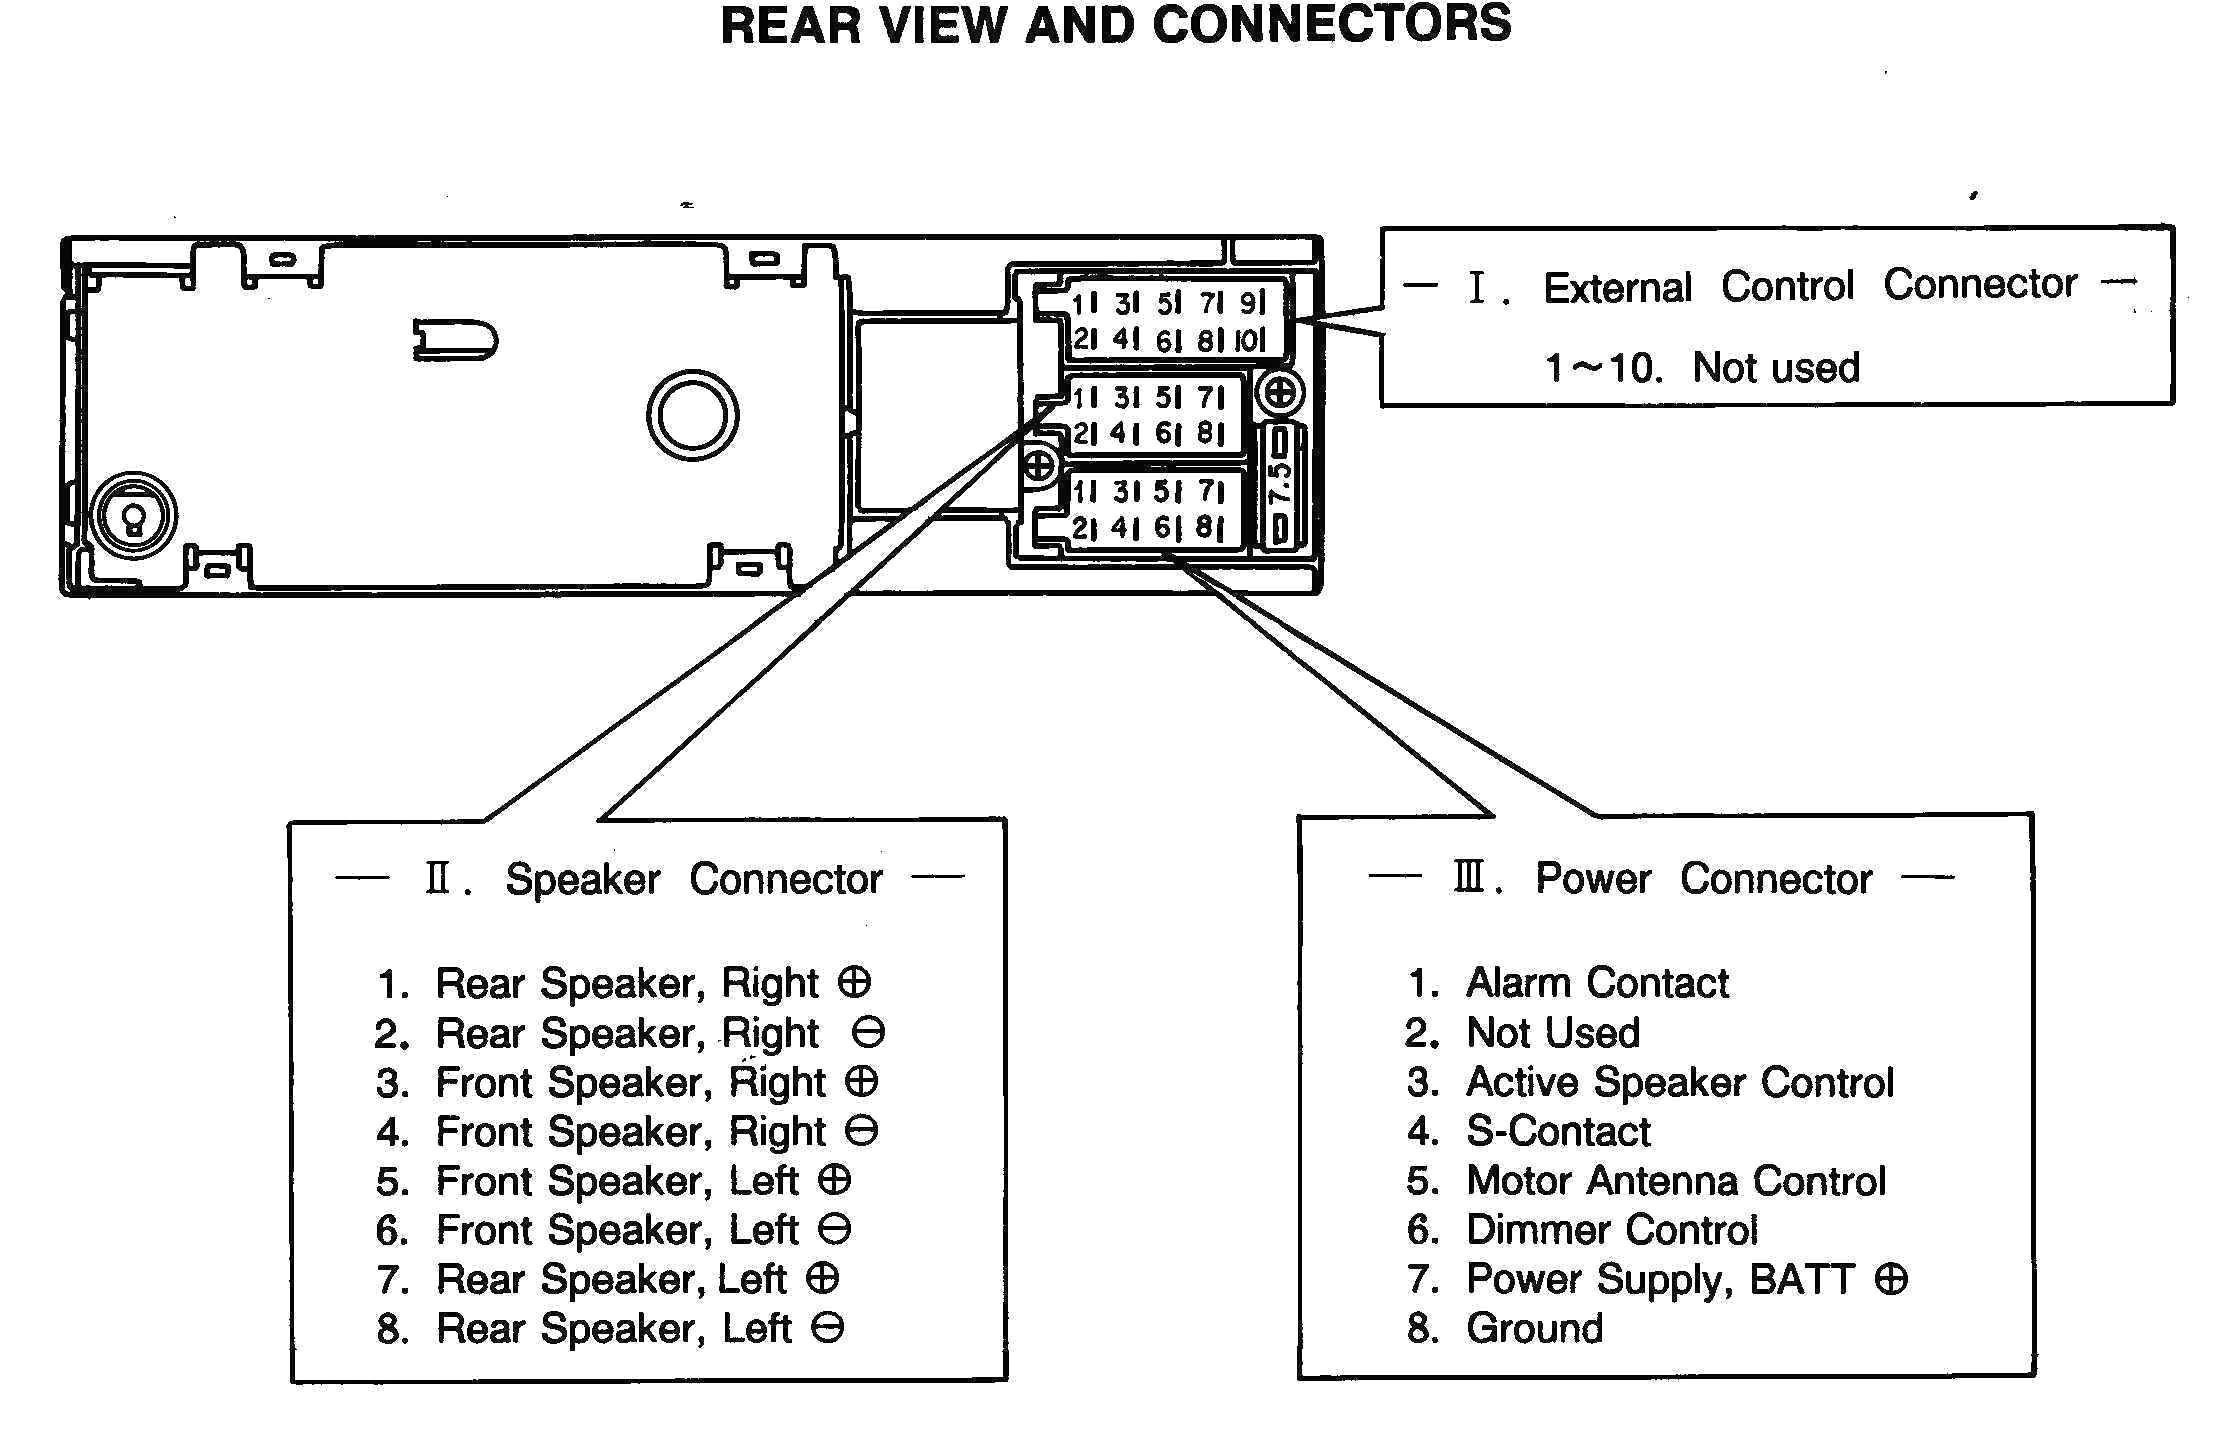 Panasonic Car Stereo Wiring Diagram Vw Stereo Wiring Harness Experts Wiring Diagram • Of Panasonic Car Stereo Wiring Diagram